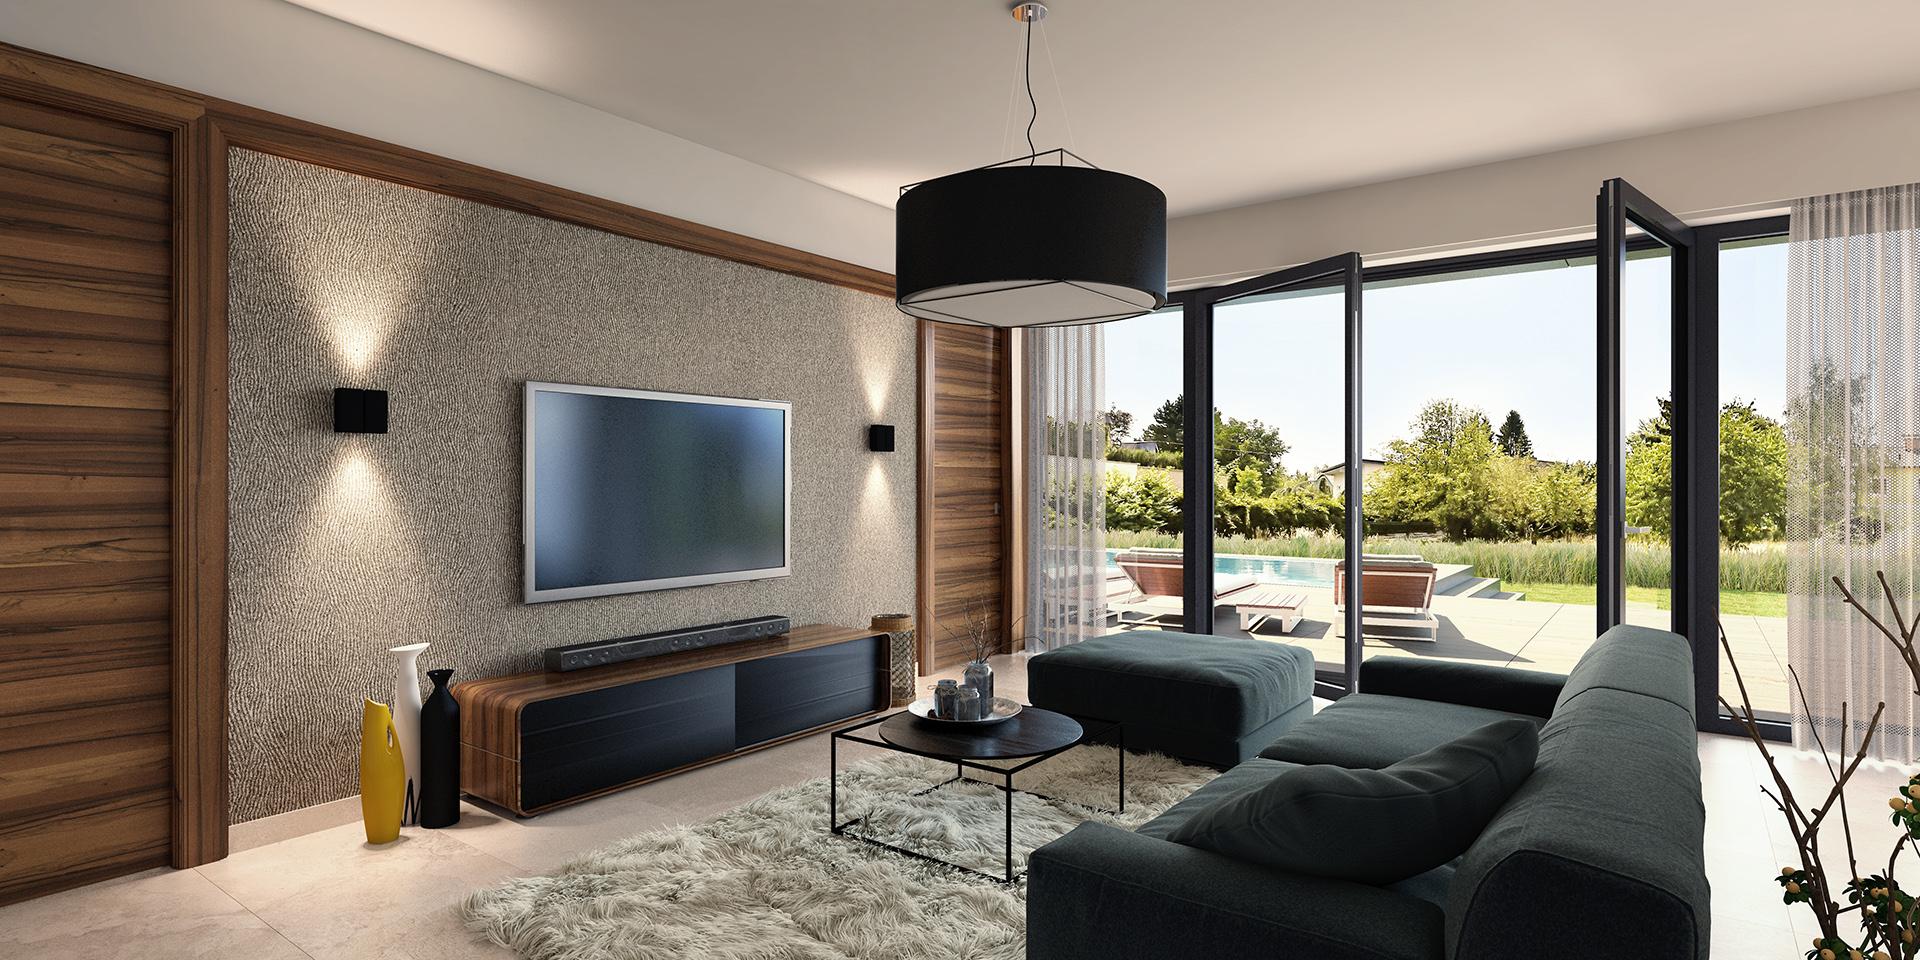 Luxusapartments Meisenweg m:quadrat